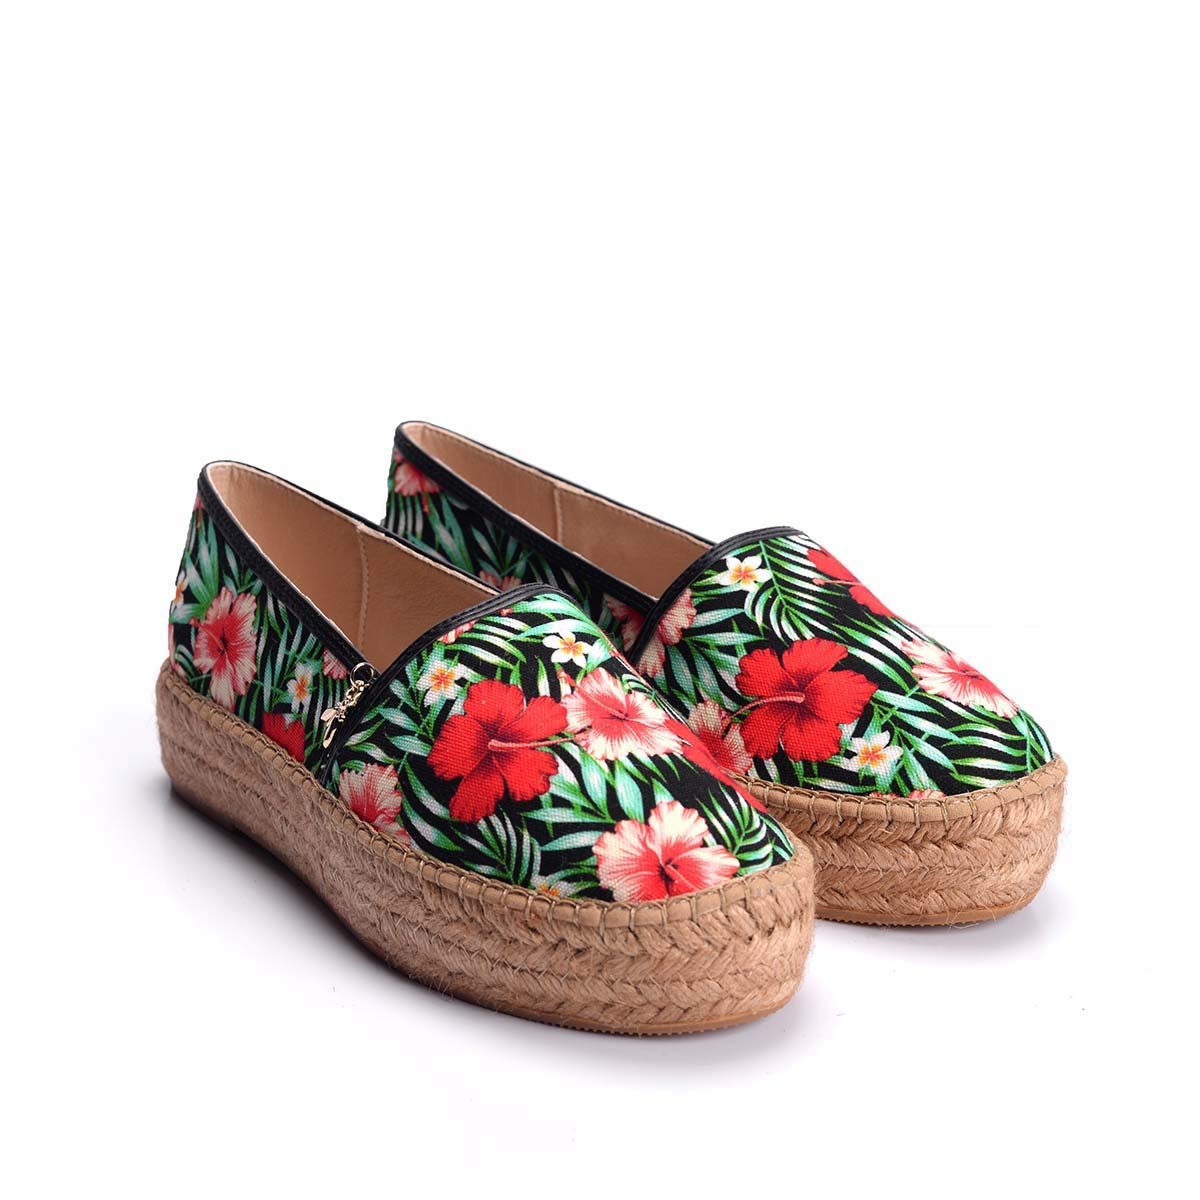 Schuhe Espadrilles Von Patrizia Pepe Tropical - 40